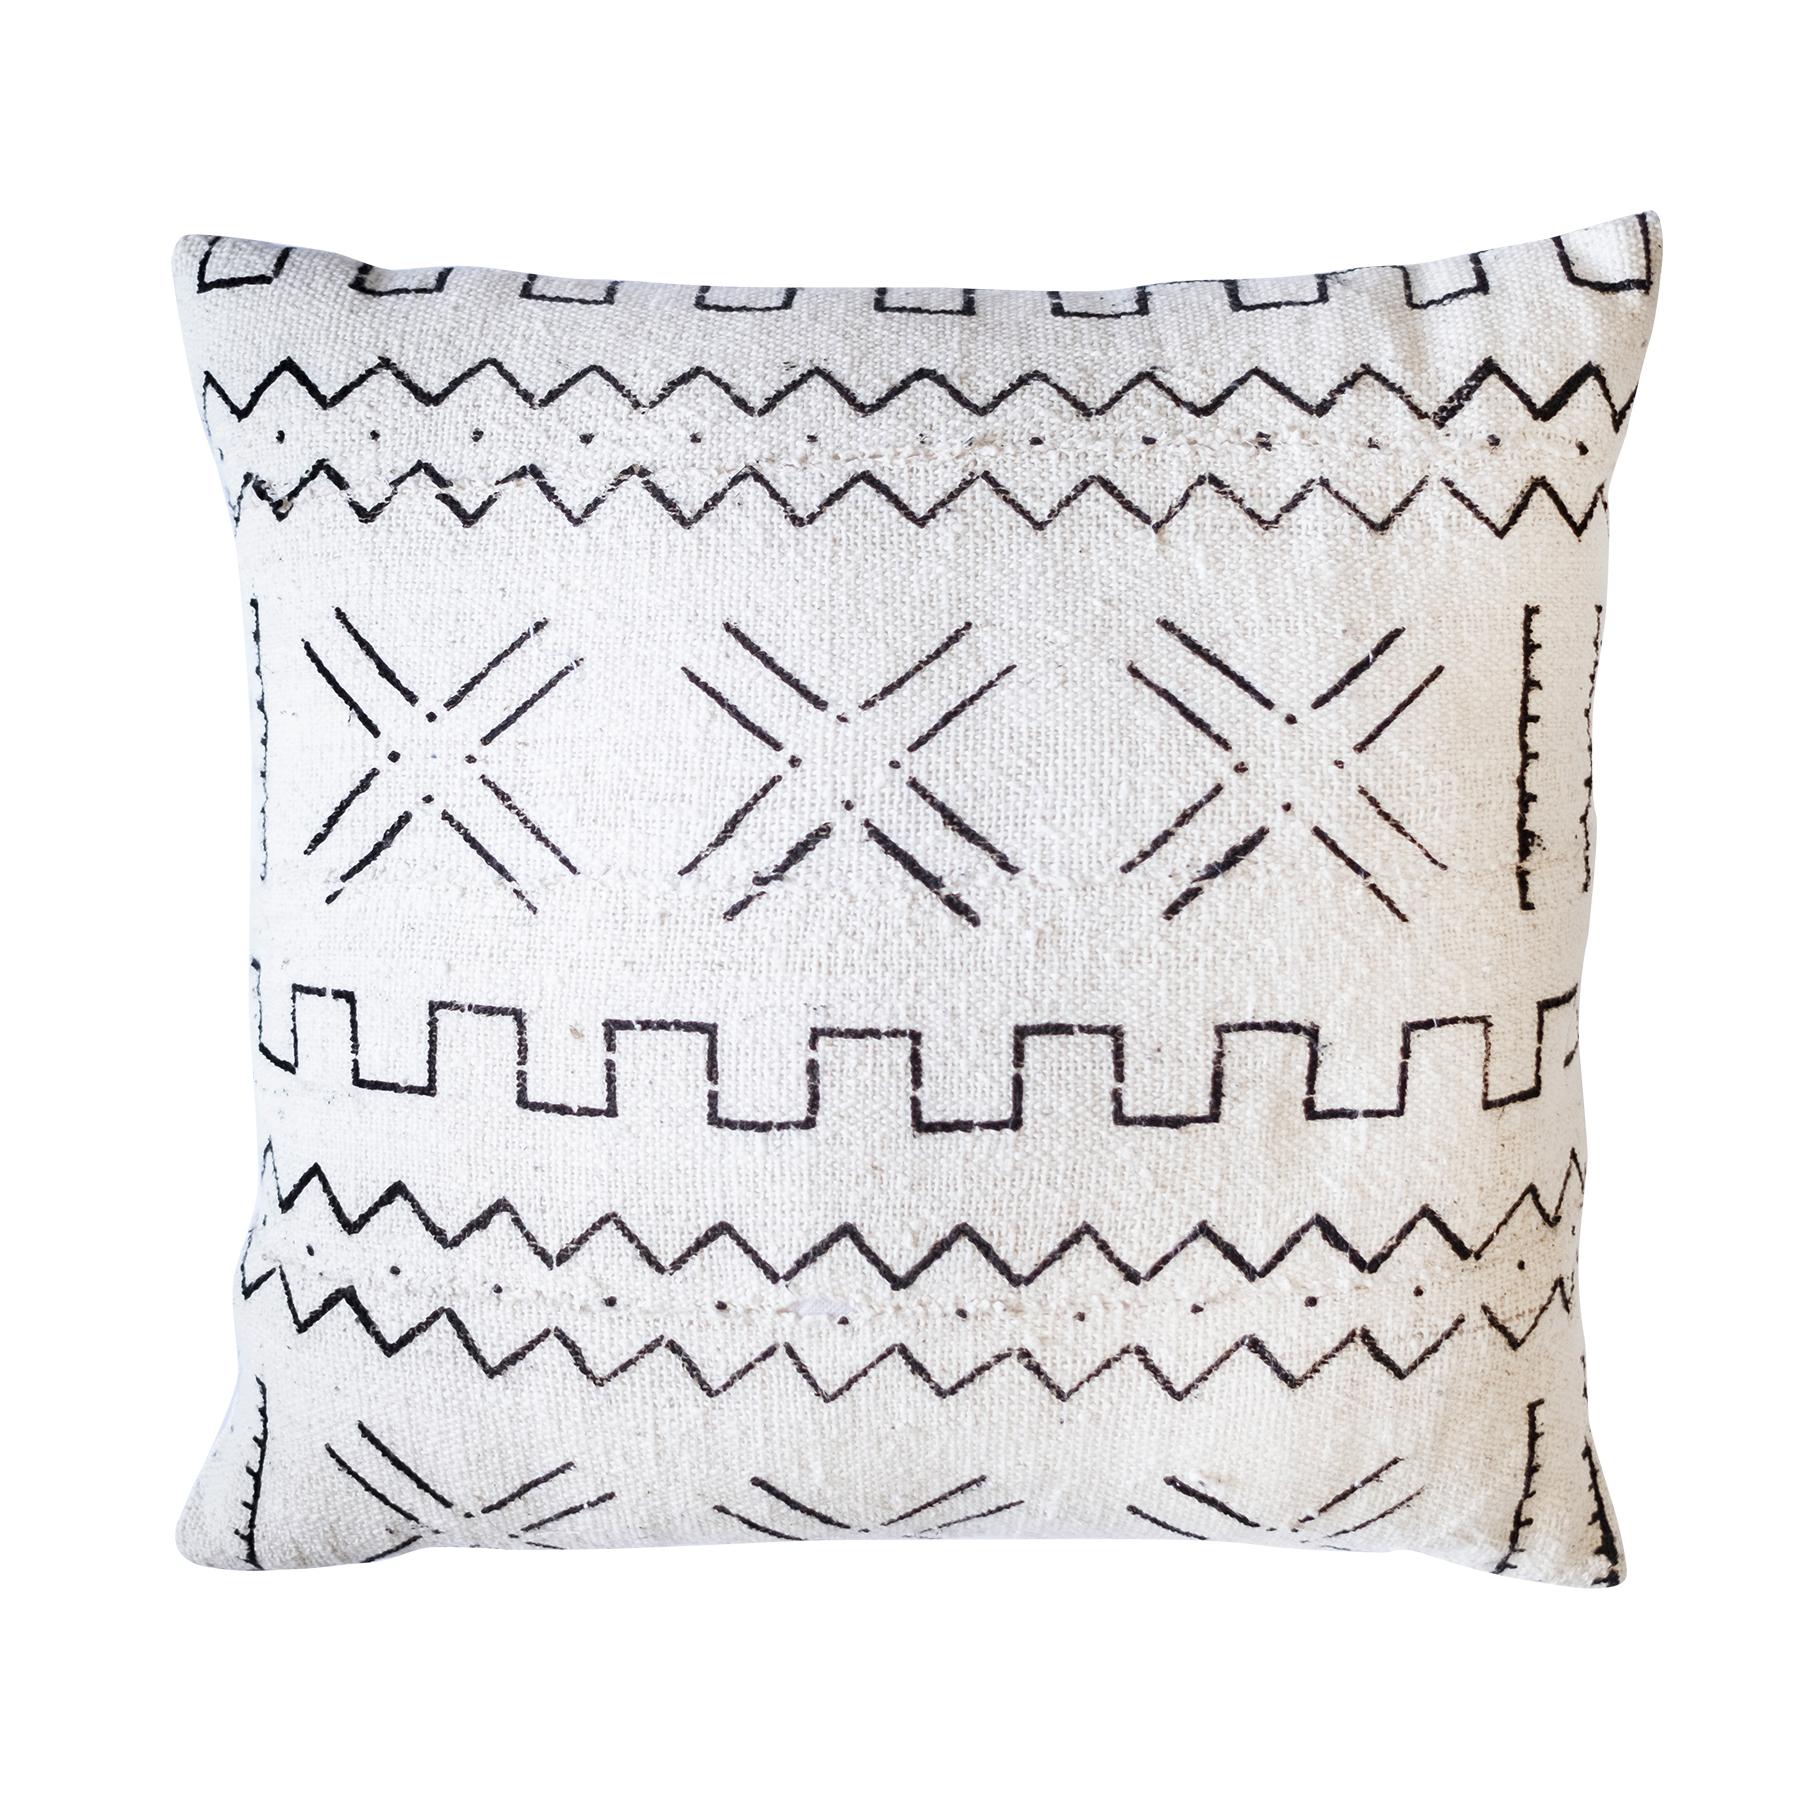 Kenya_white_mudcloth_pattern.jpg